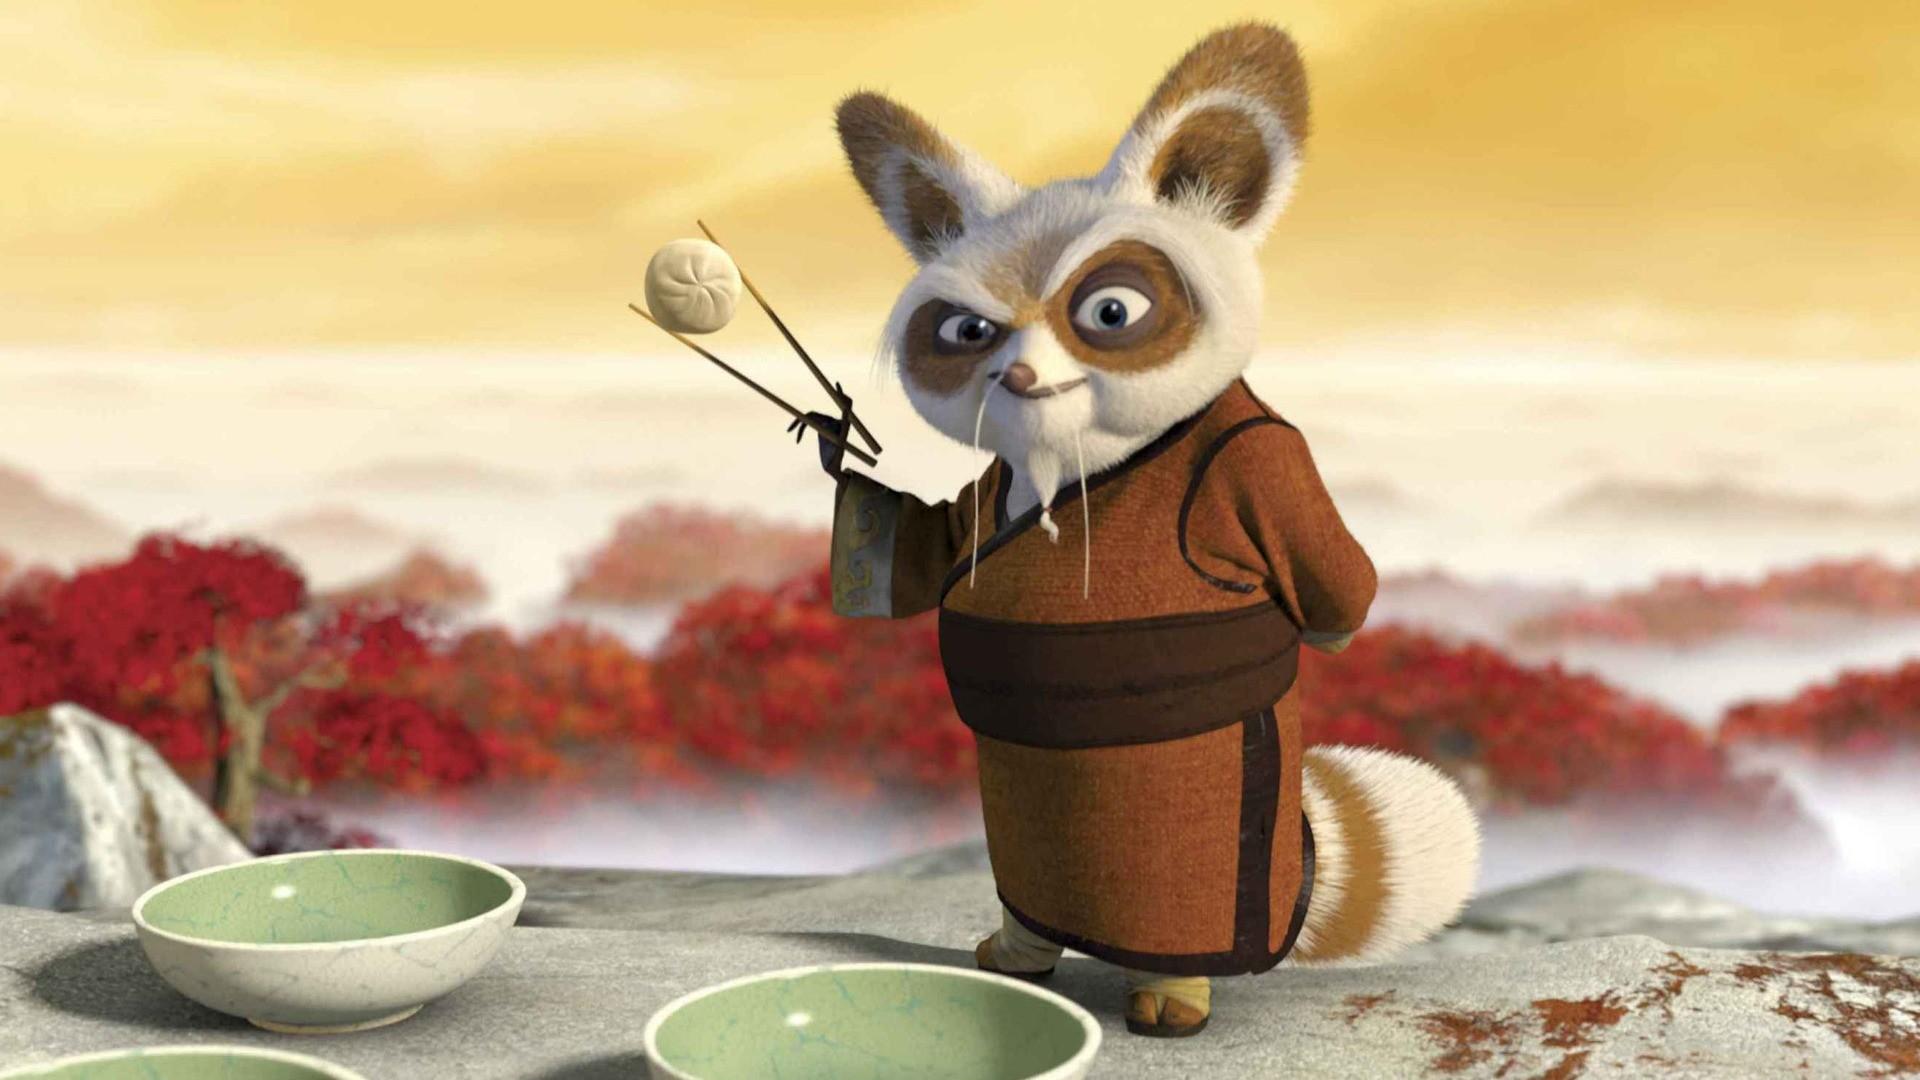 Res: 1920x1080, Kung Fu Panda HD wallpaper #3 - .